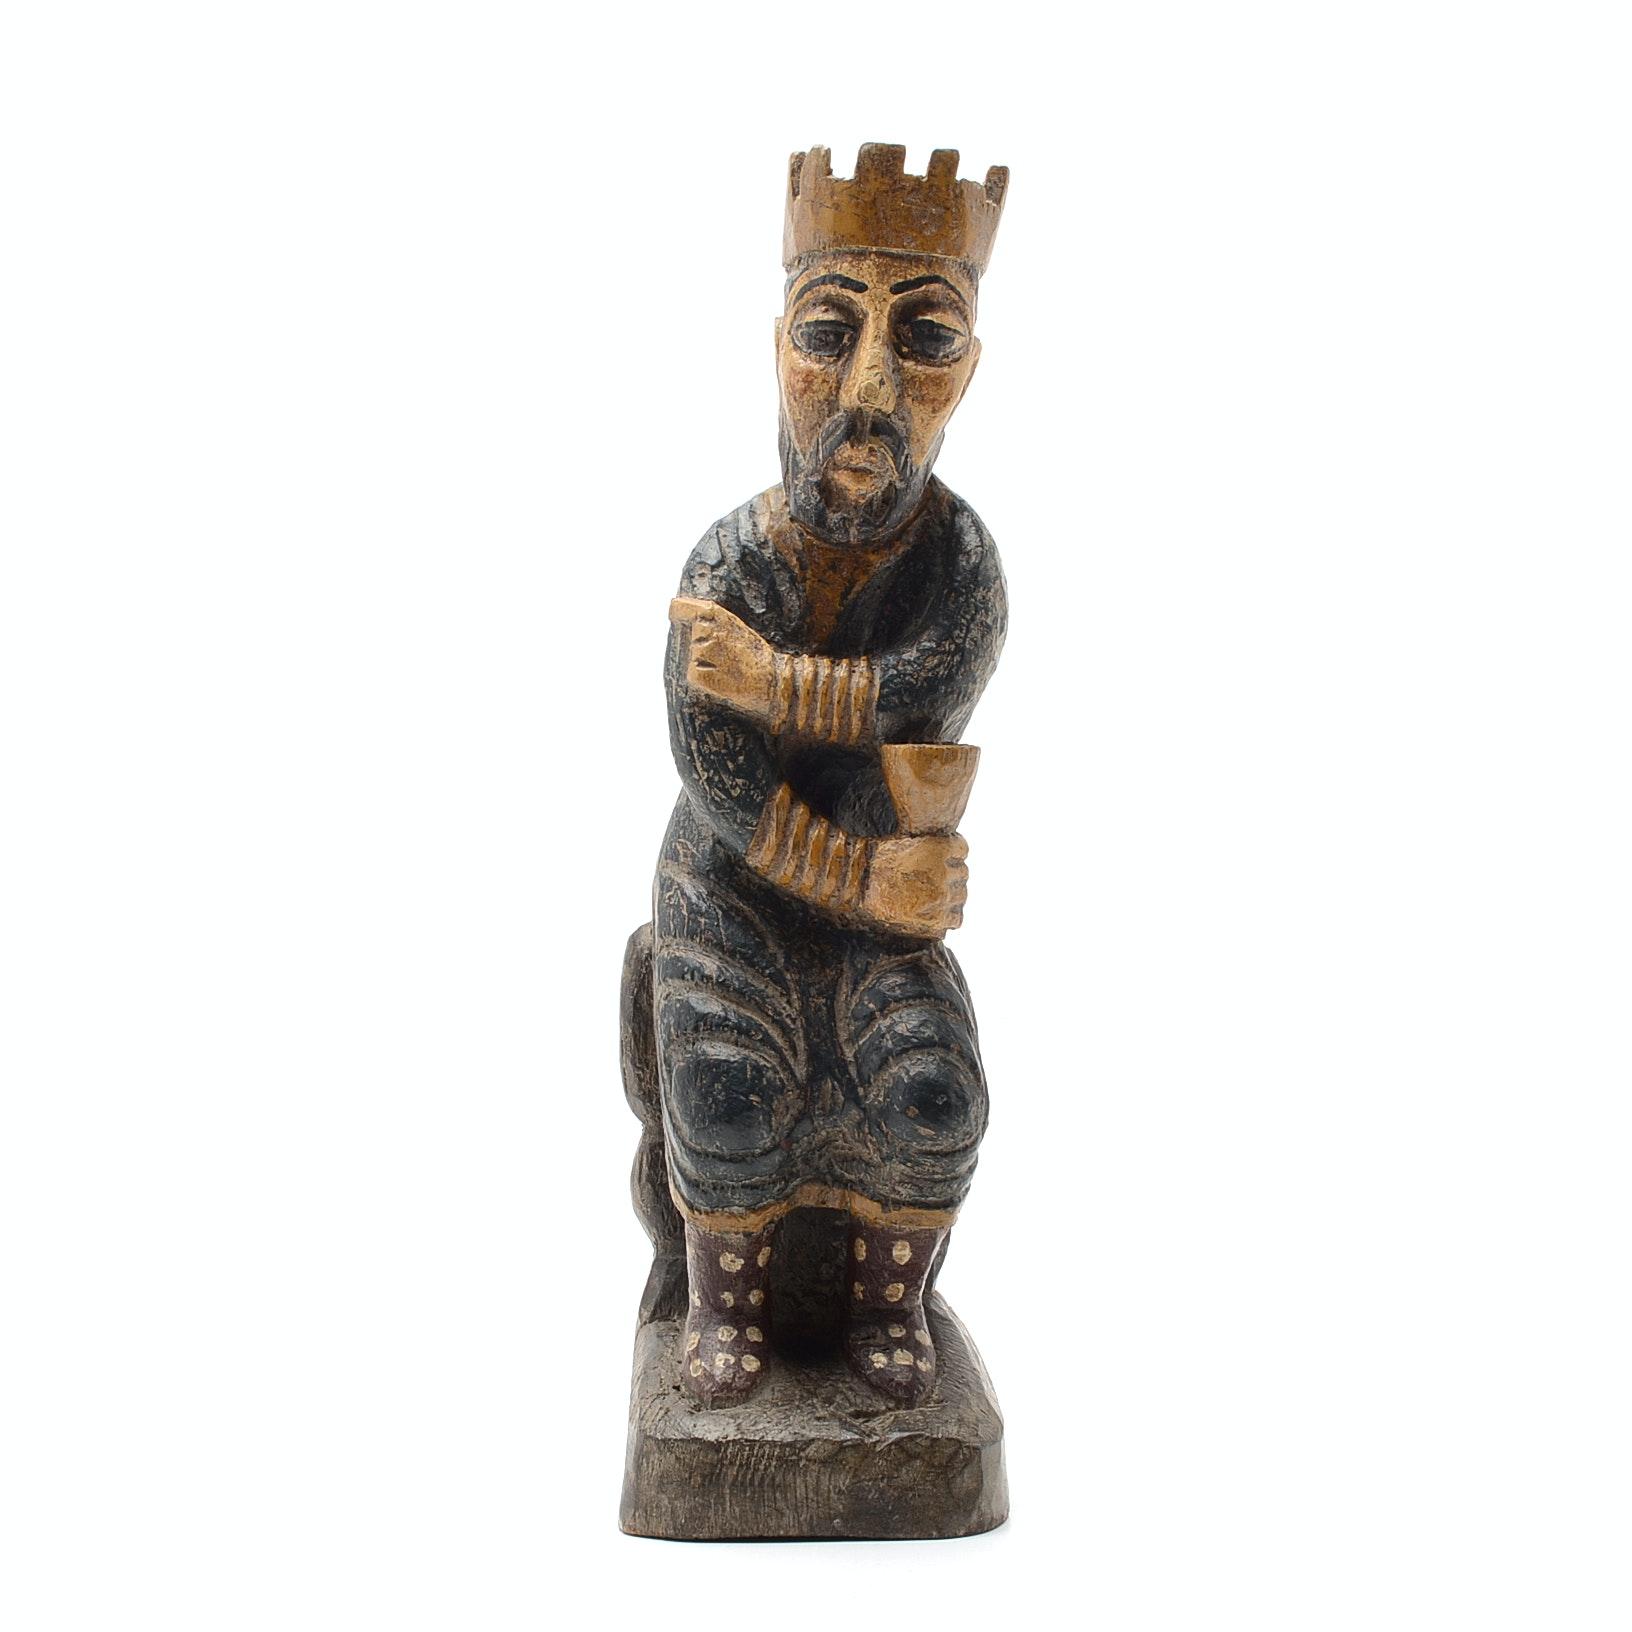 Antique Continental Wood Sculpture of a King Solomon